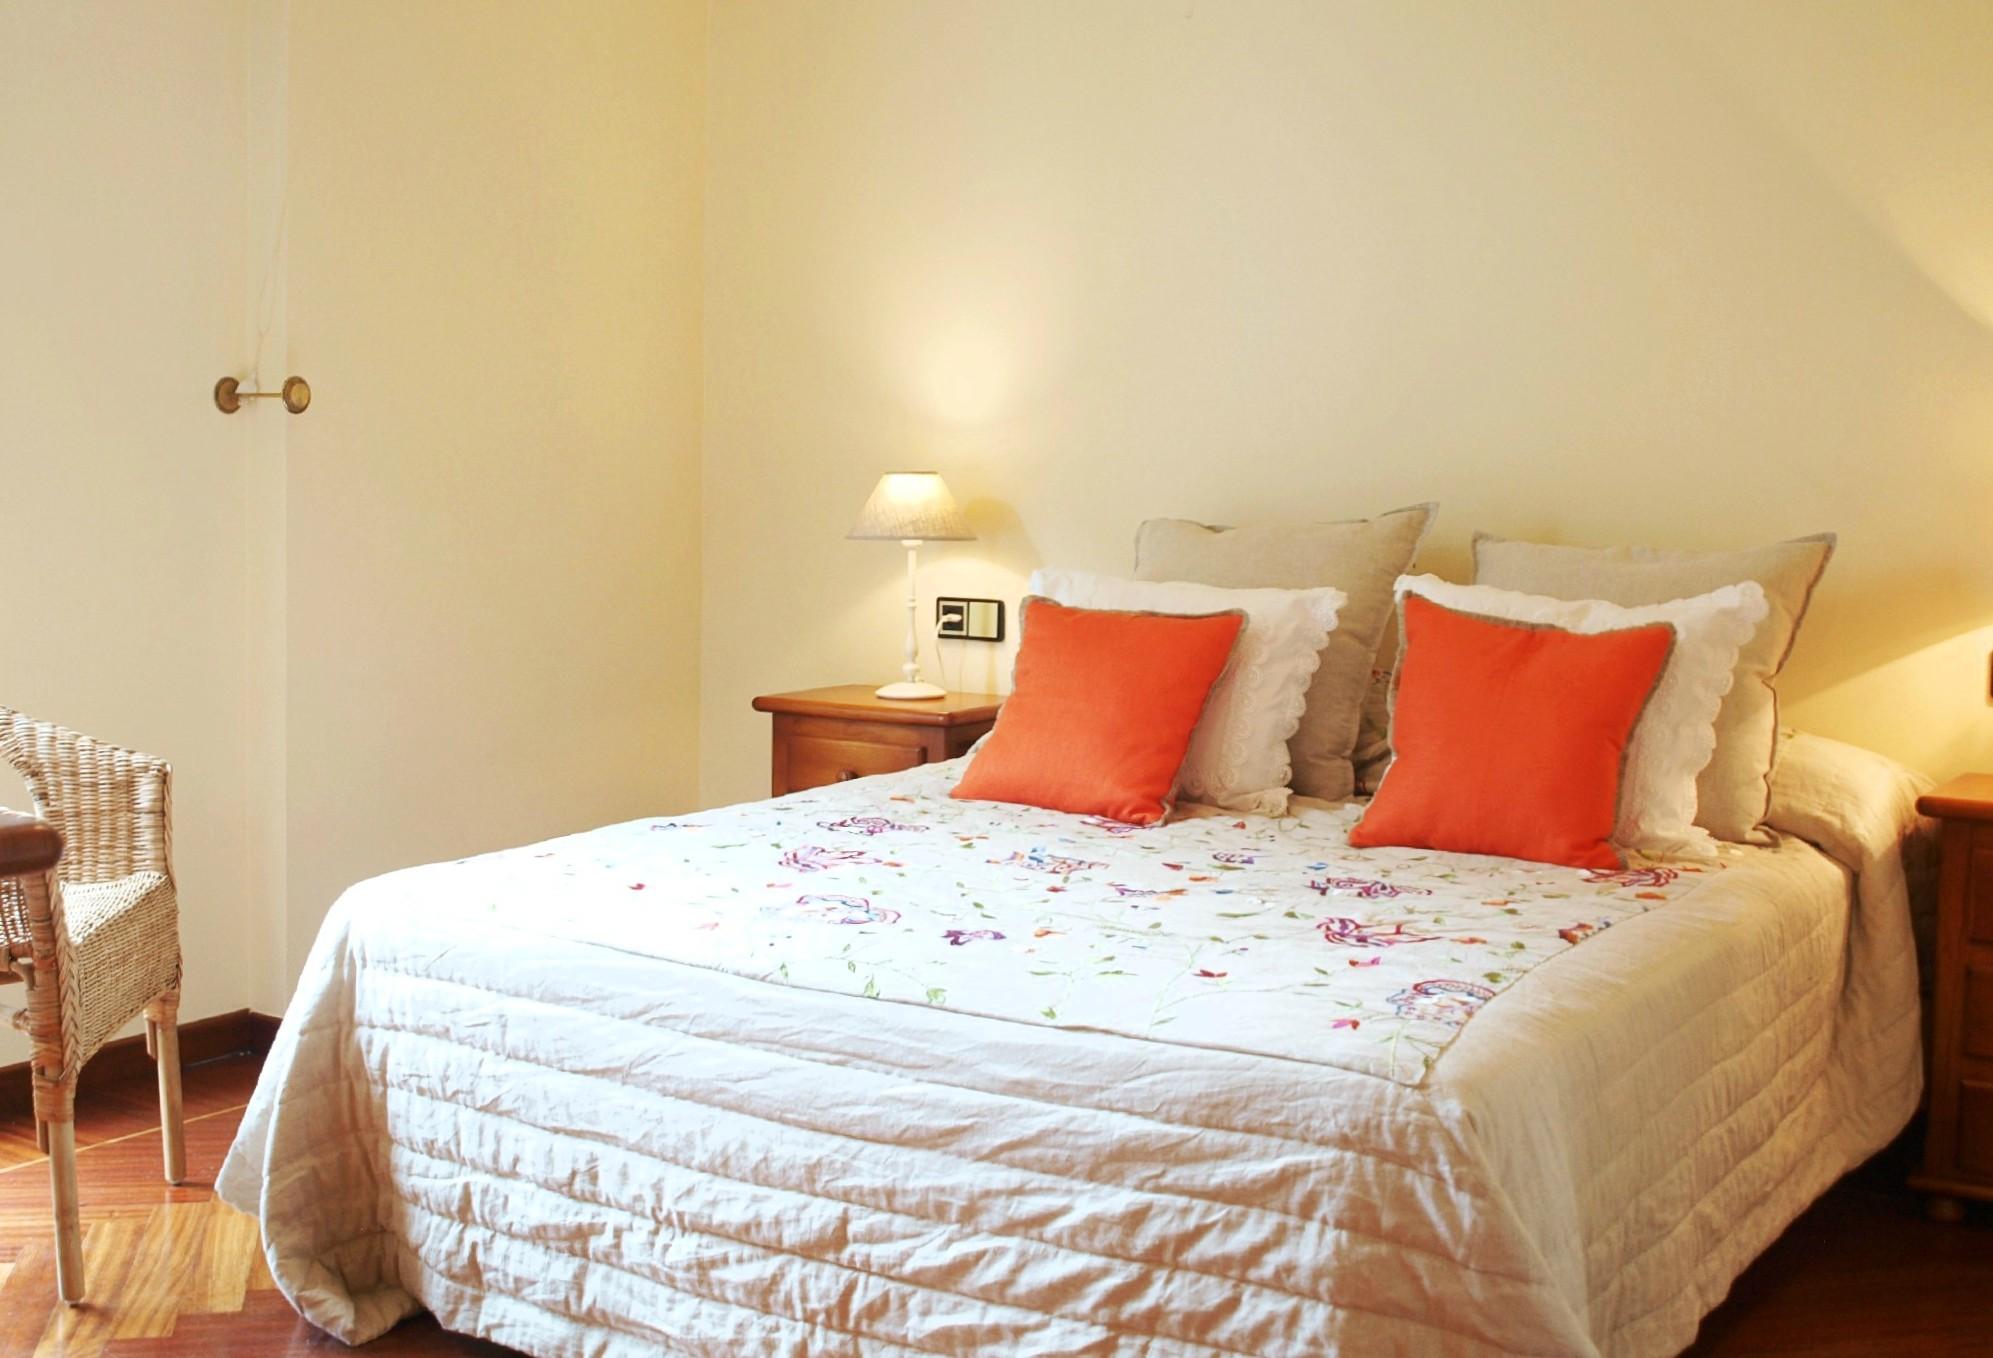 P5308381 Select Home Rentalsselect Home Rentals